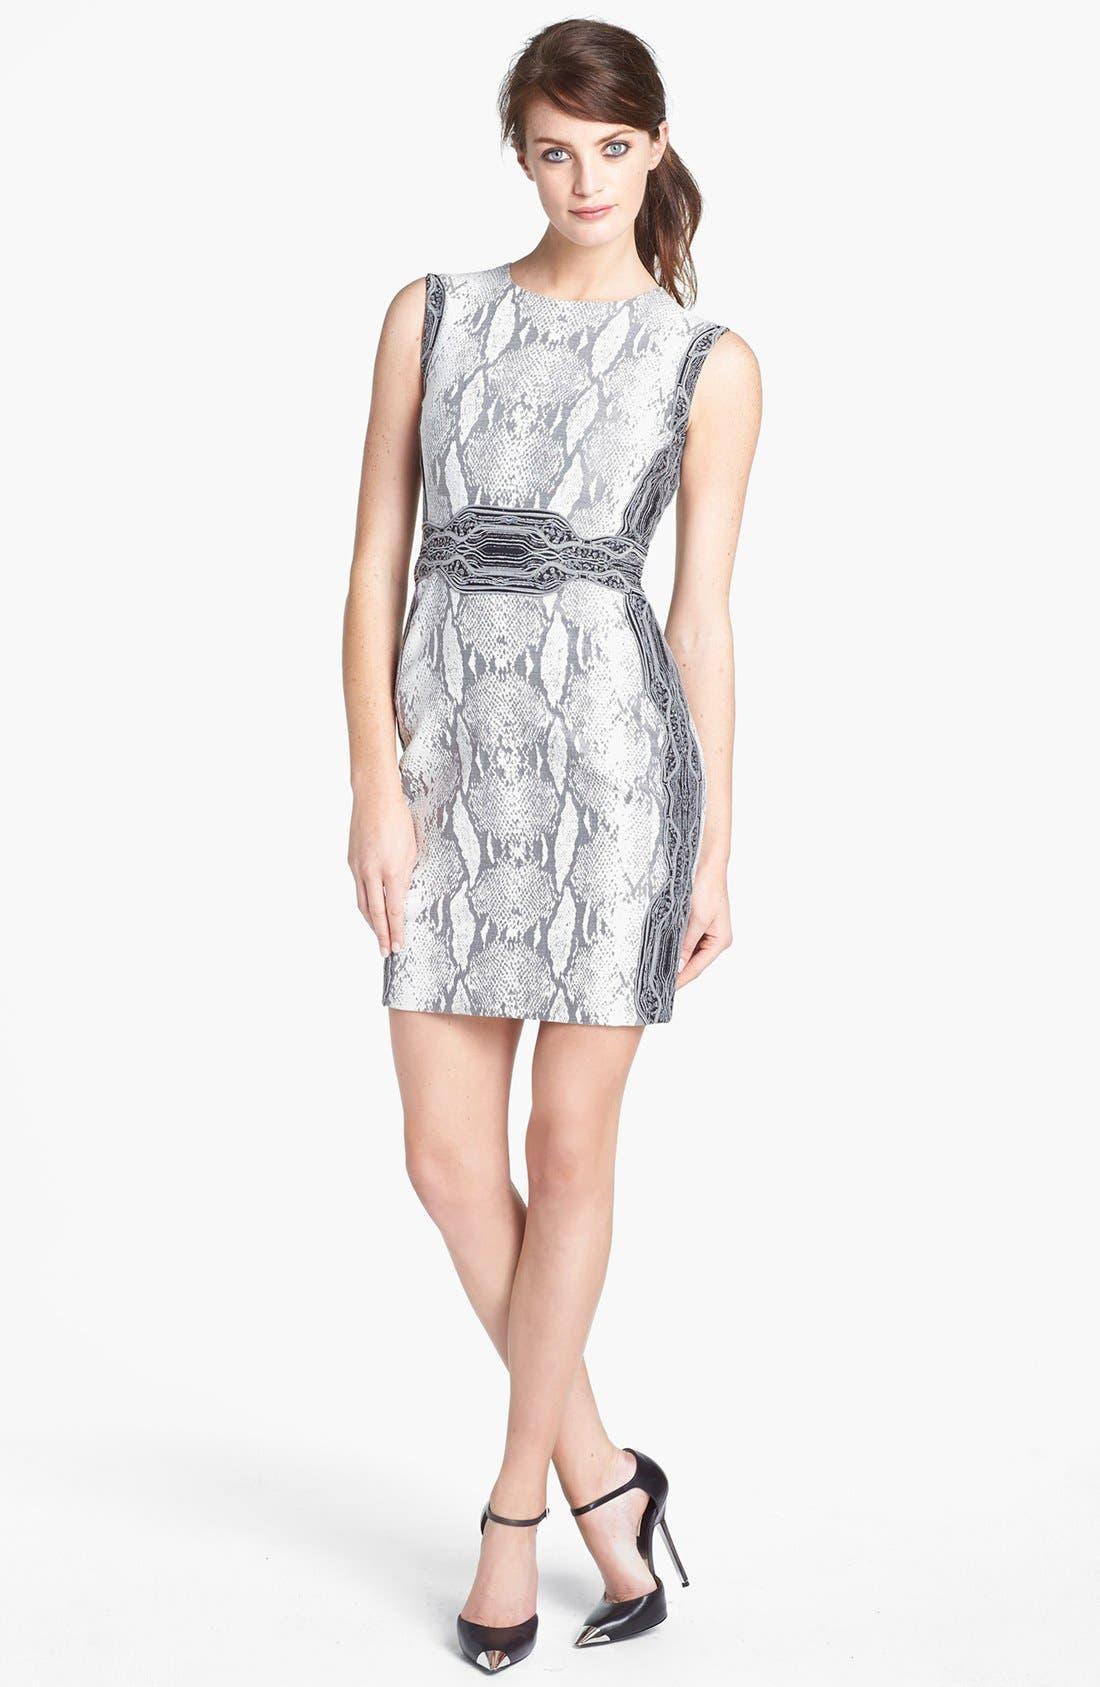 Alternate Image 1 Selected - Diane von Furstenberg 'Bey' Snake Print Sleeveless Dress